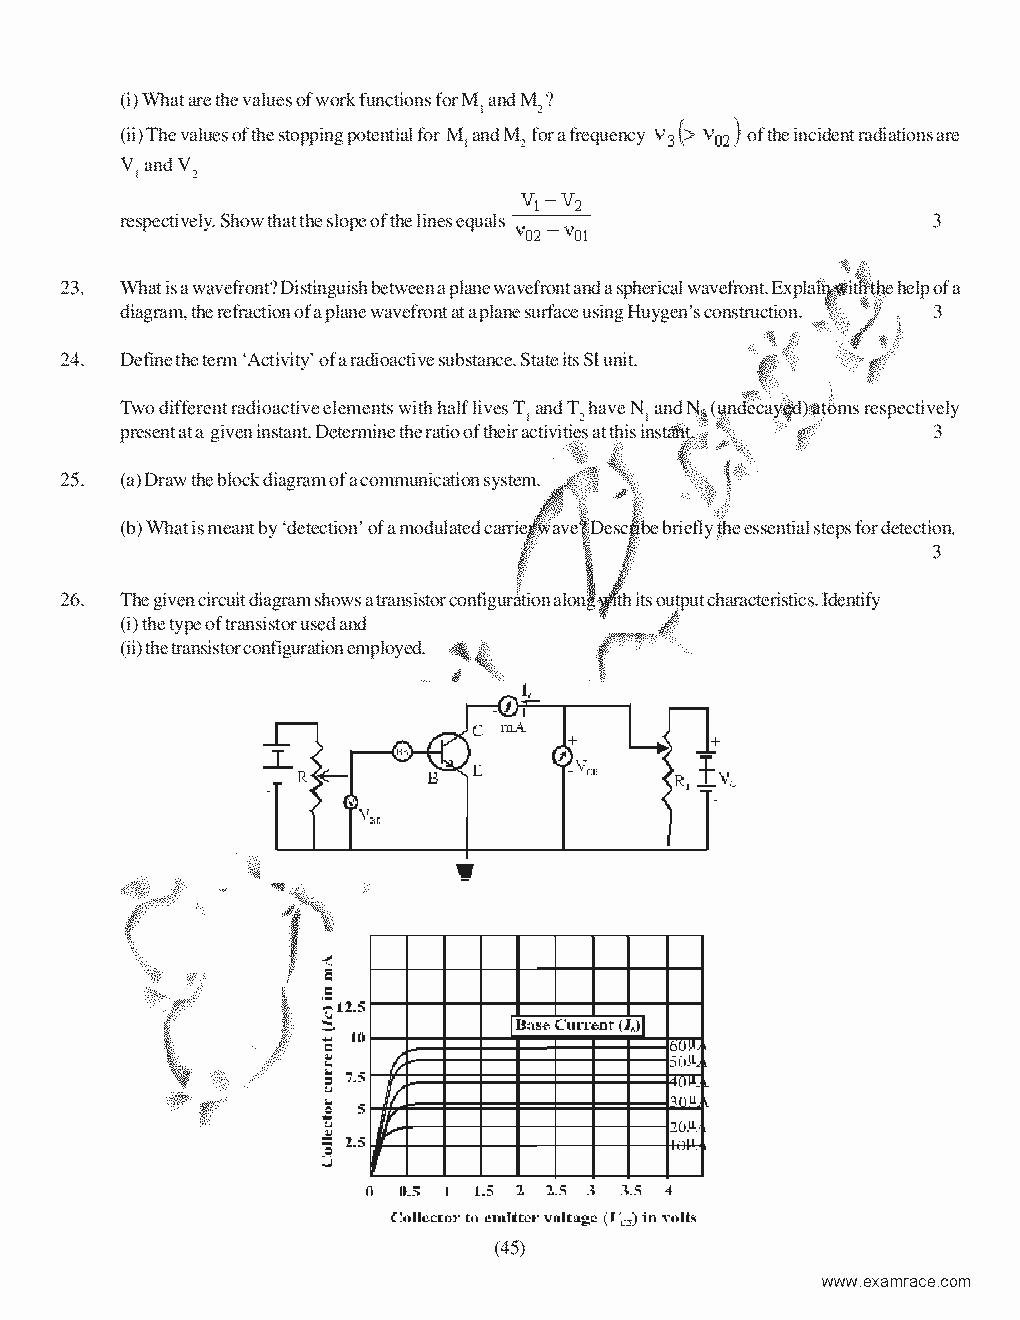 Cbse 2014 Physics Question Paper Pdf